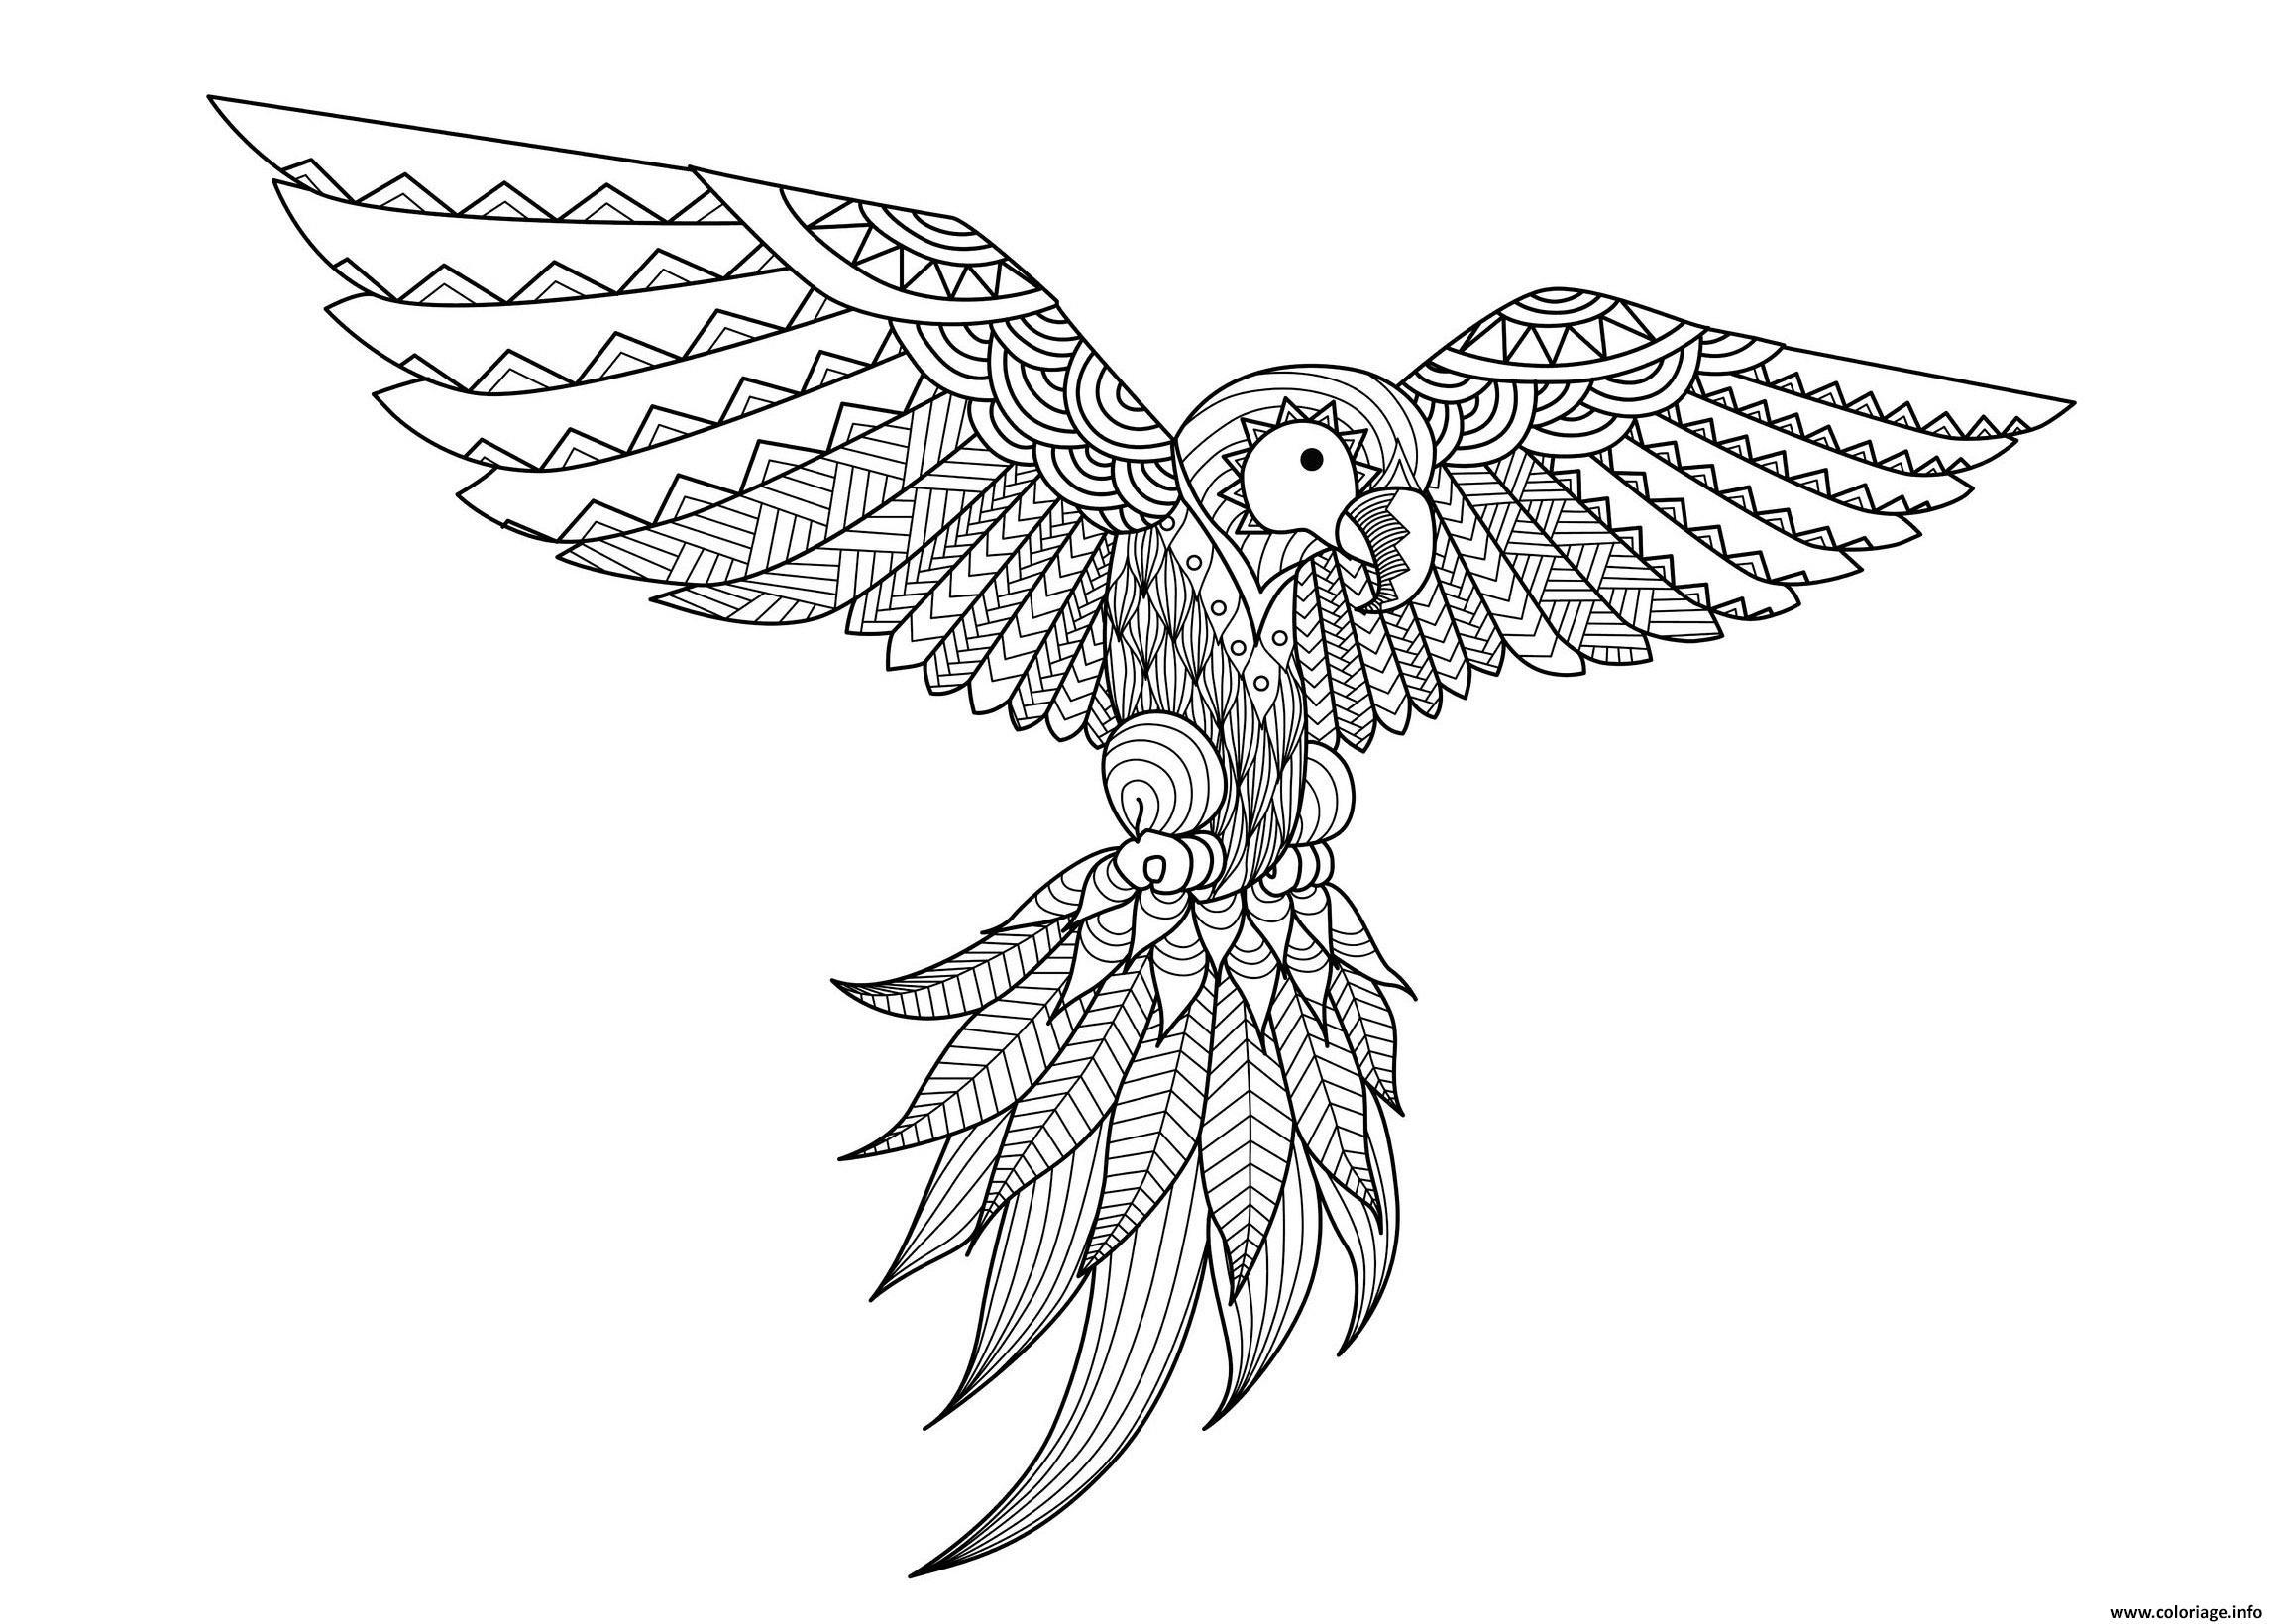 Coloriage Adulte Difficile Zentangle Perroquet Par Bimdeedee avec Perroquet Coloriage A Imprimer